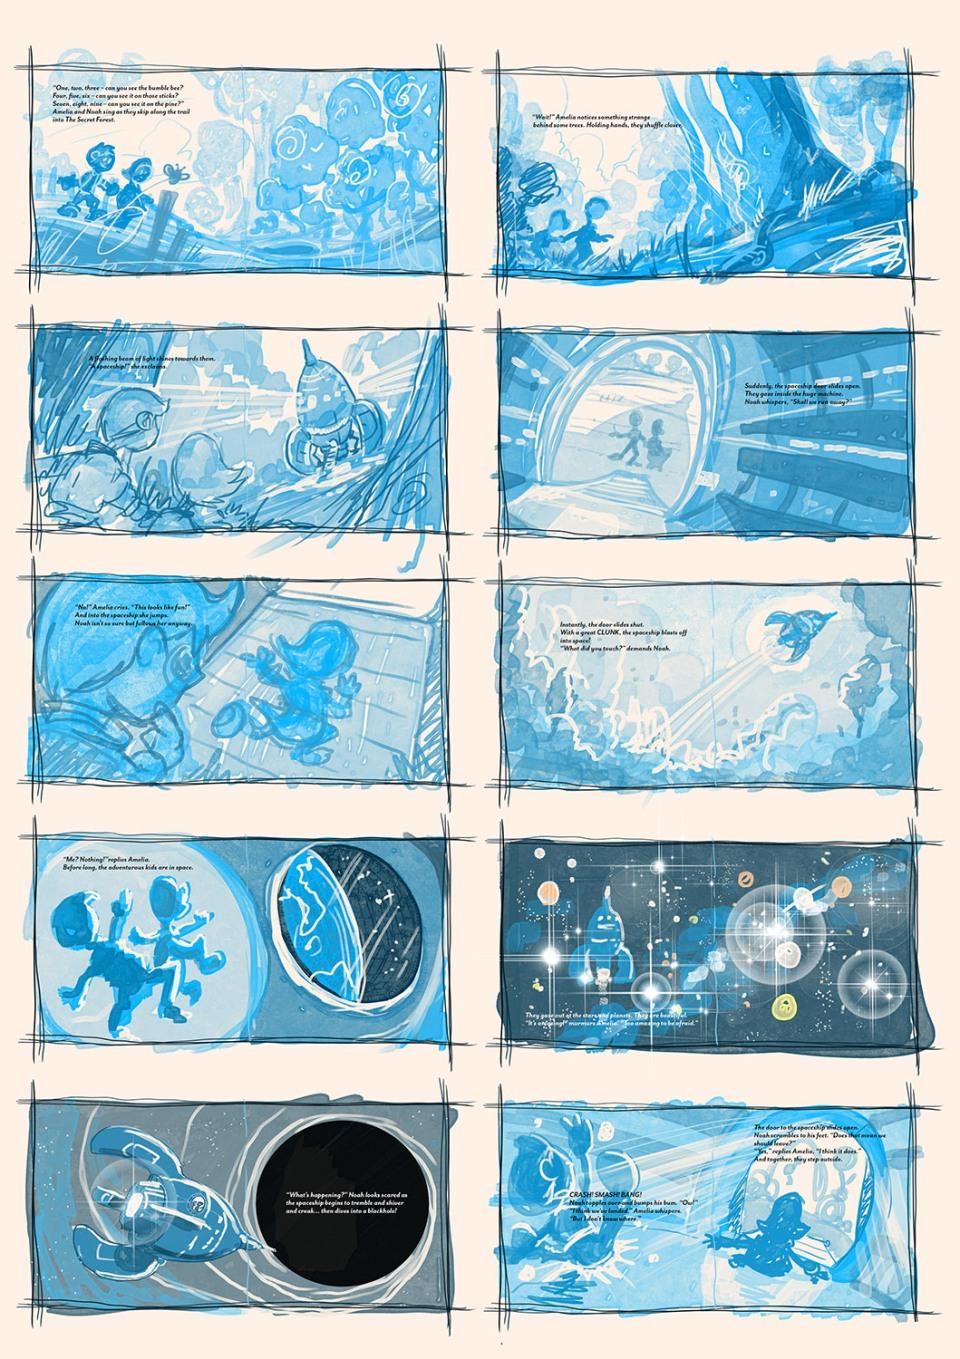 1500xThe Hidden Spaceship STORYBOARD 1 - Spreads 01-10 TEXT